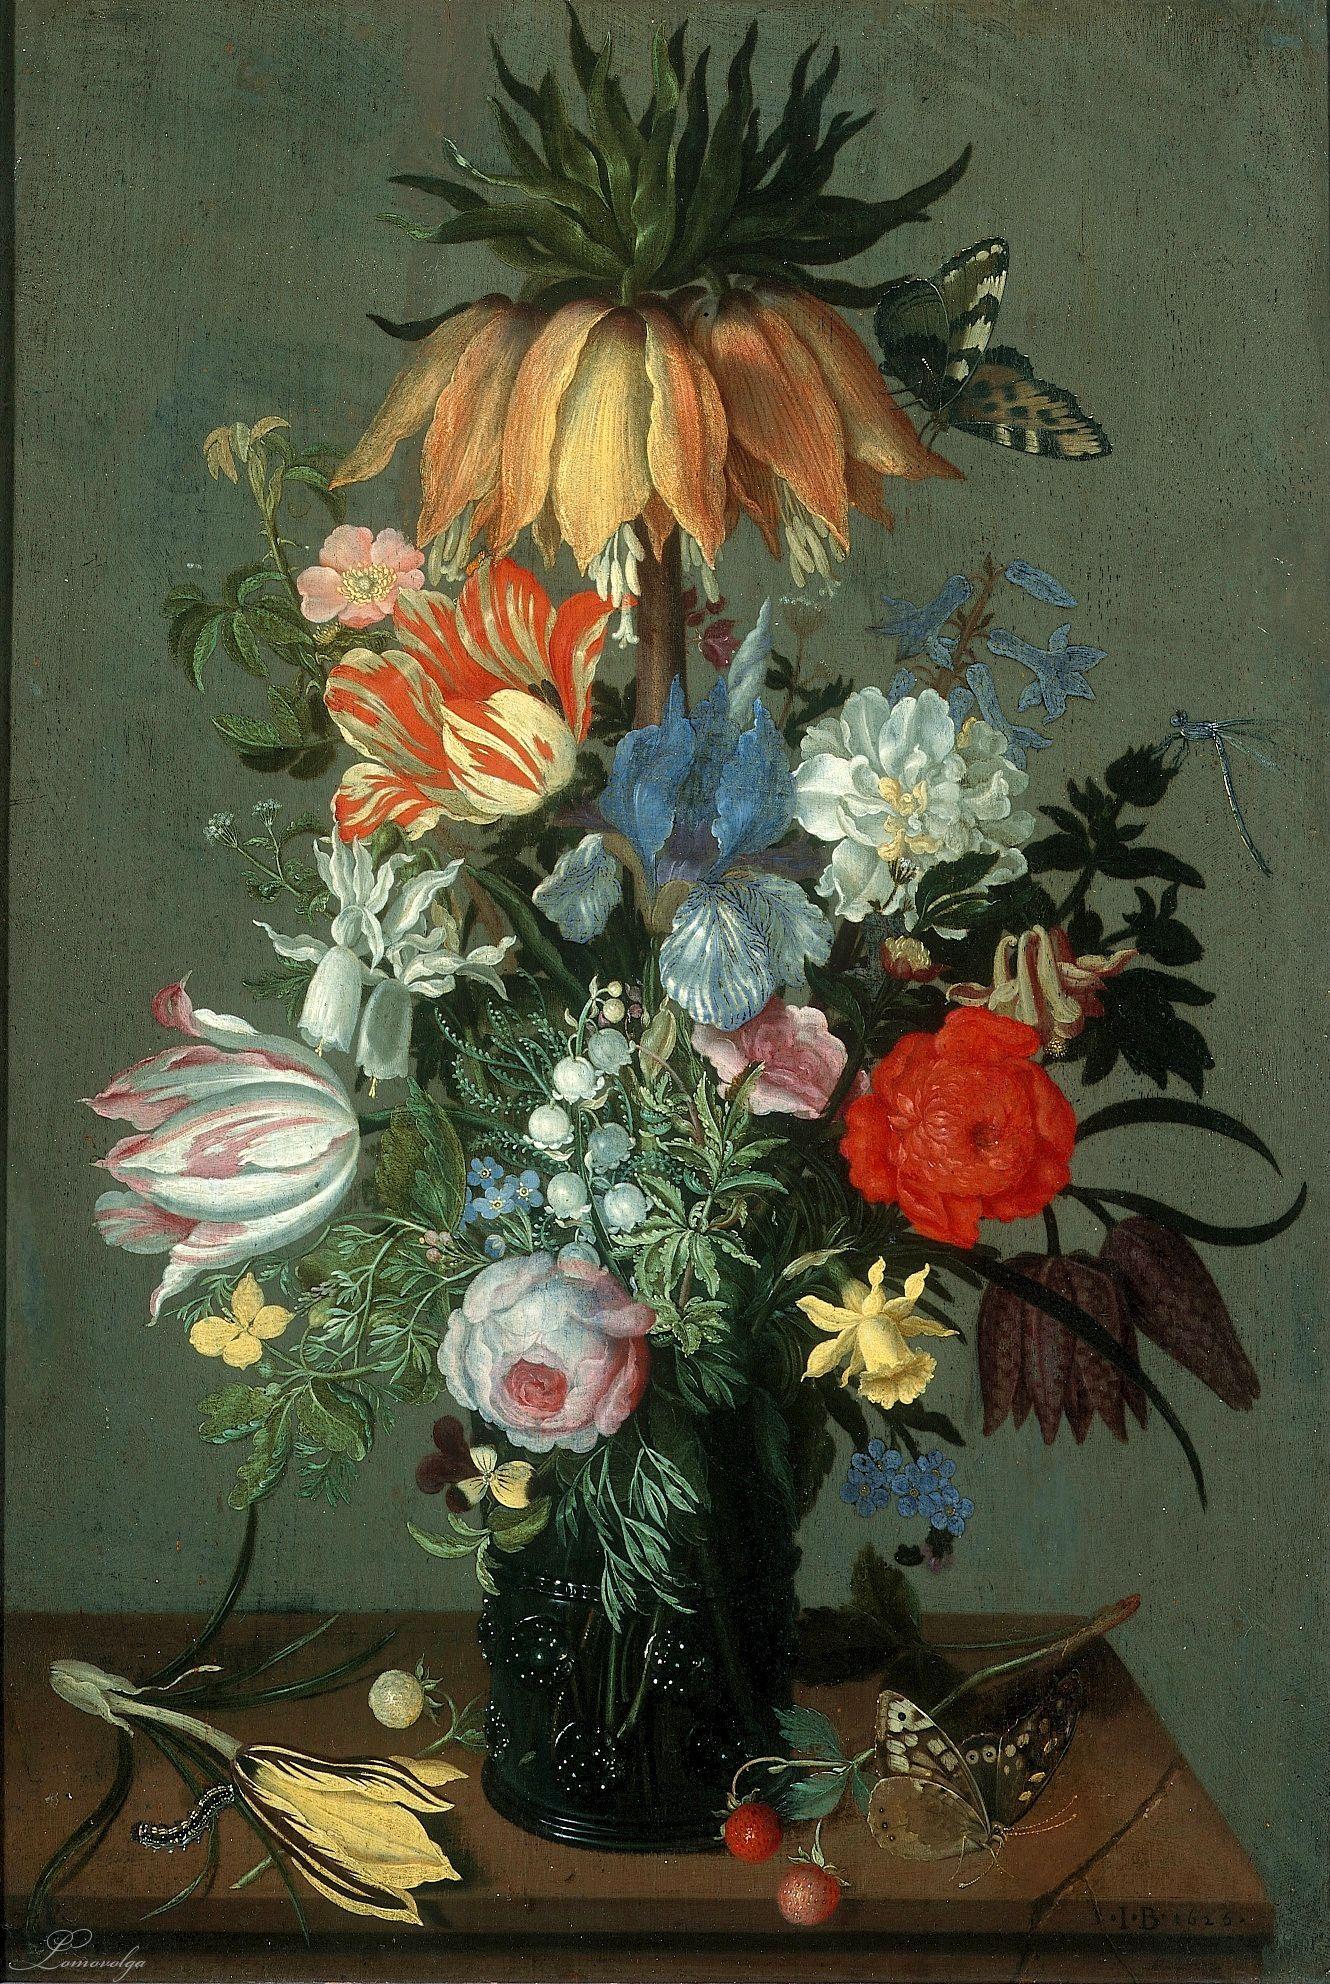 Johannes Bosschaert (1606/08-1628/29) — Flower Still Life with Crown Imperial